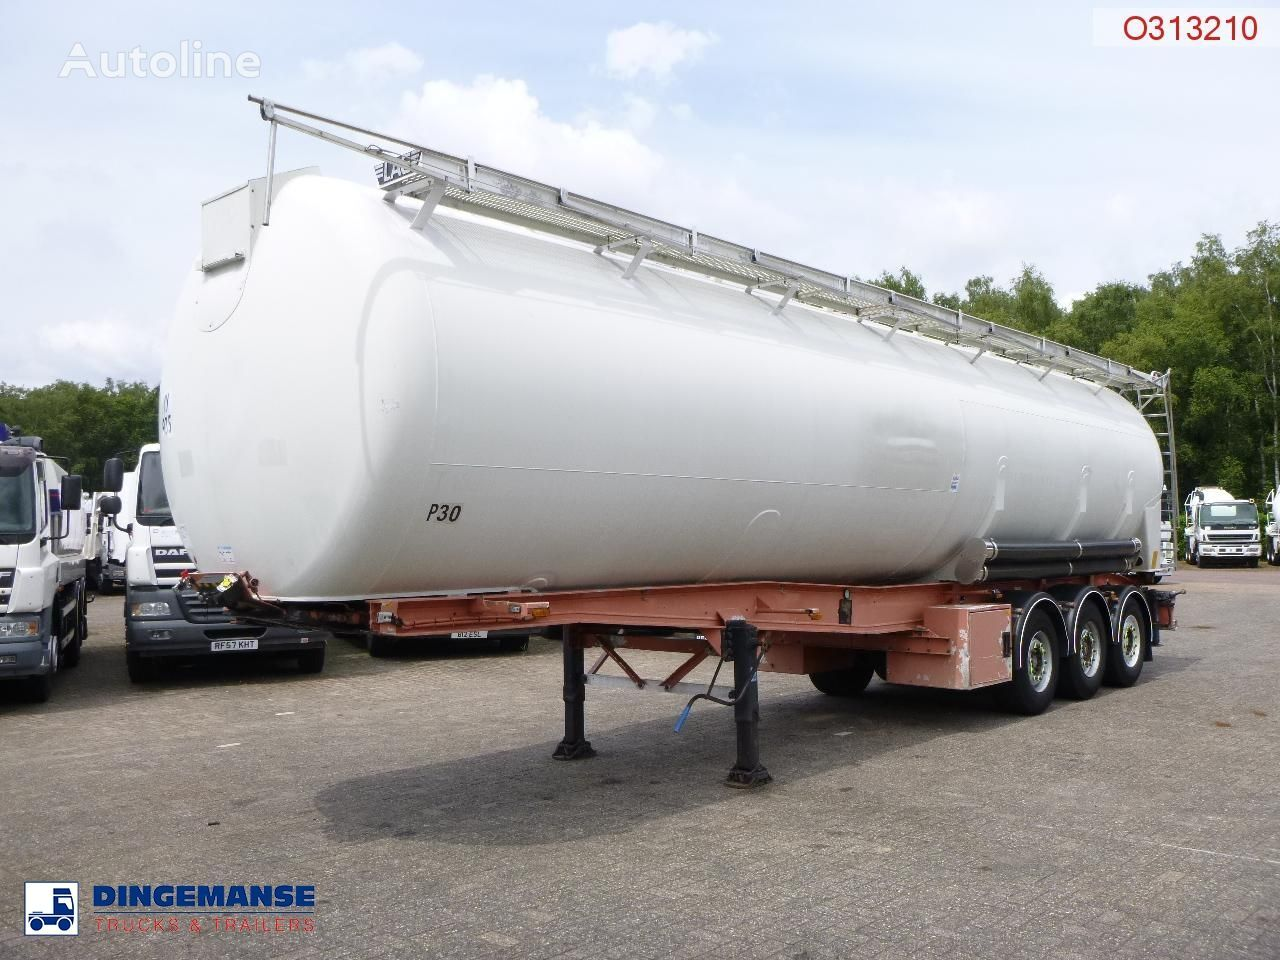 cisterna silo LAG Powder tank alu 60.5 m3 (tipping)